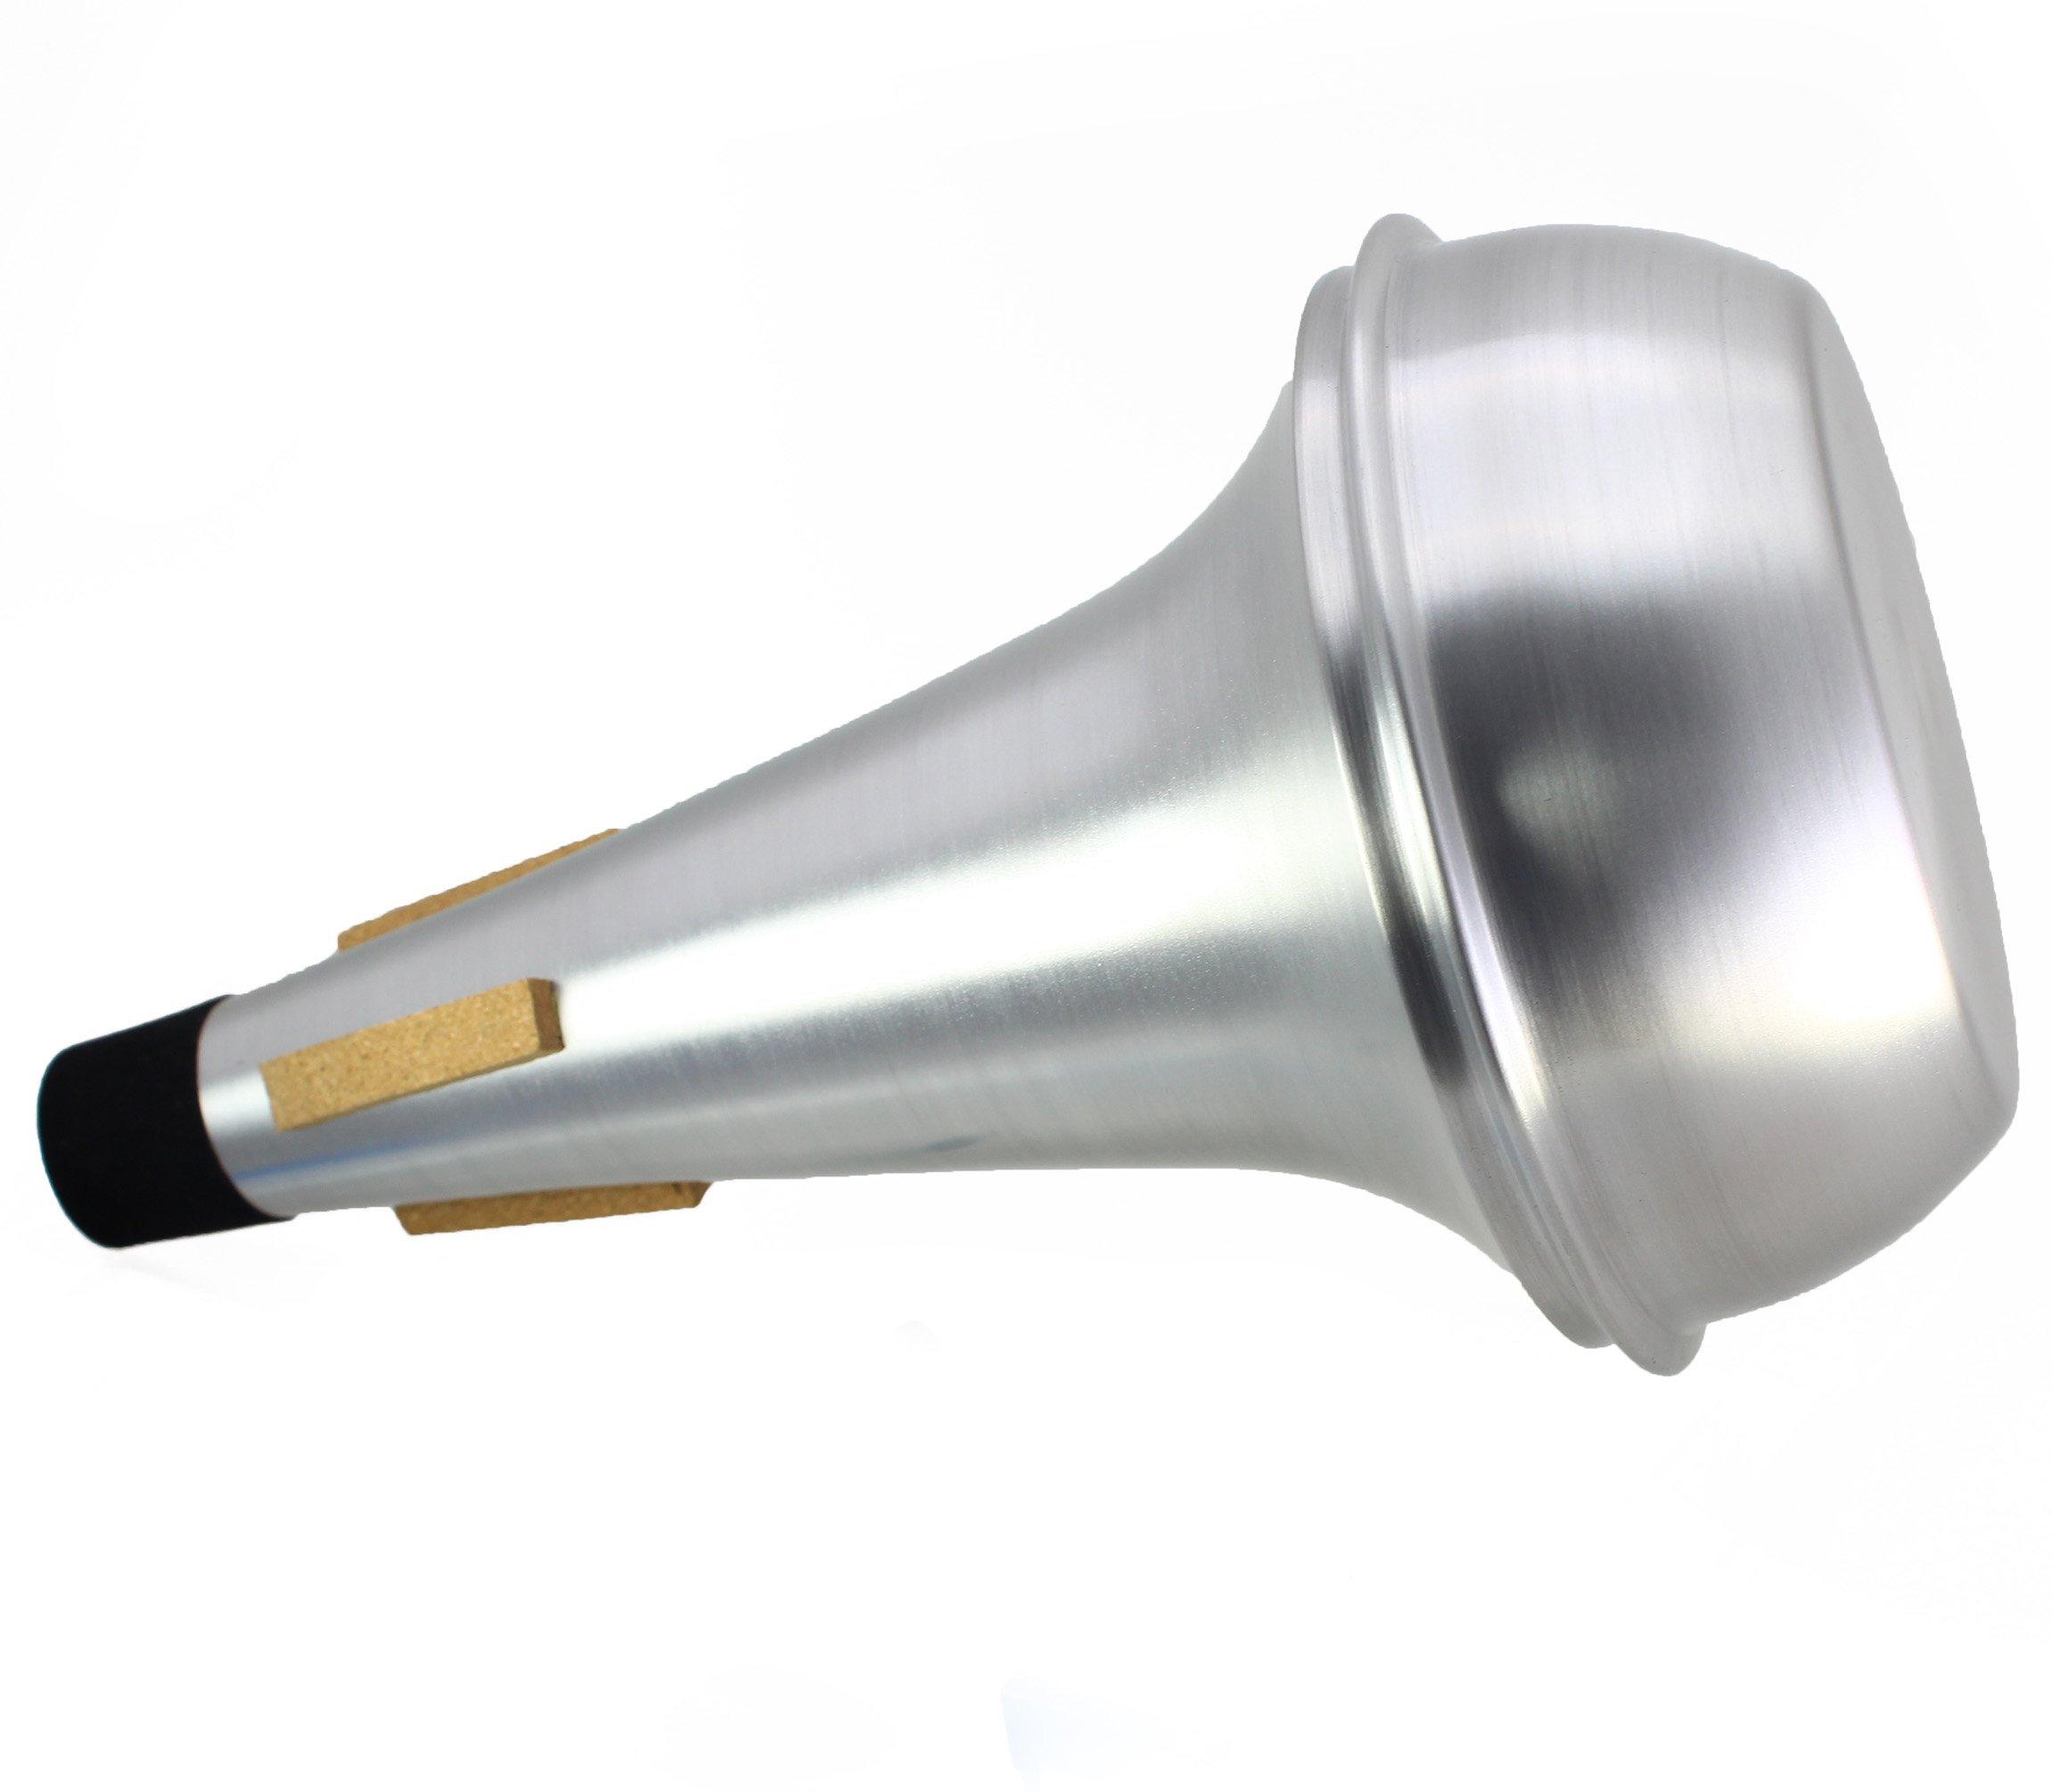 LotFancy Trombone Straight Mute, Aluminum by LotFancy (Image #6)